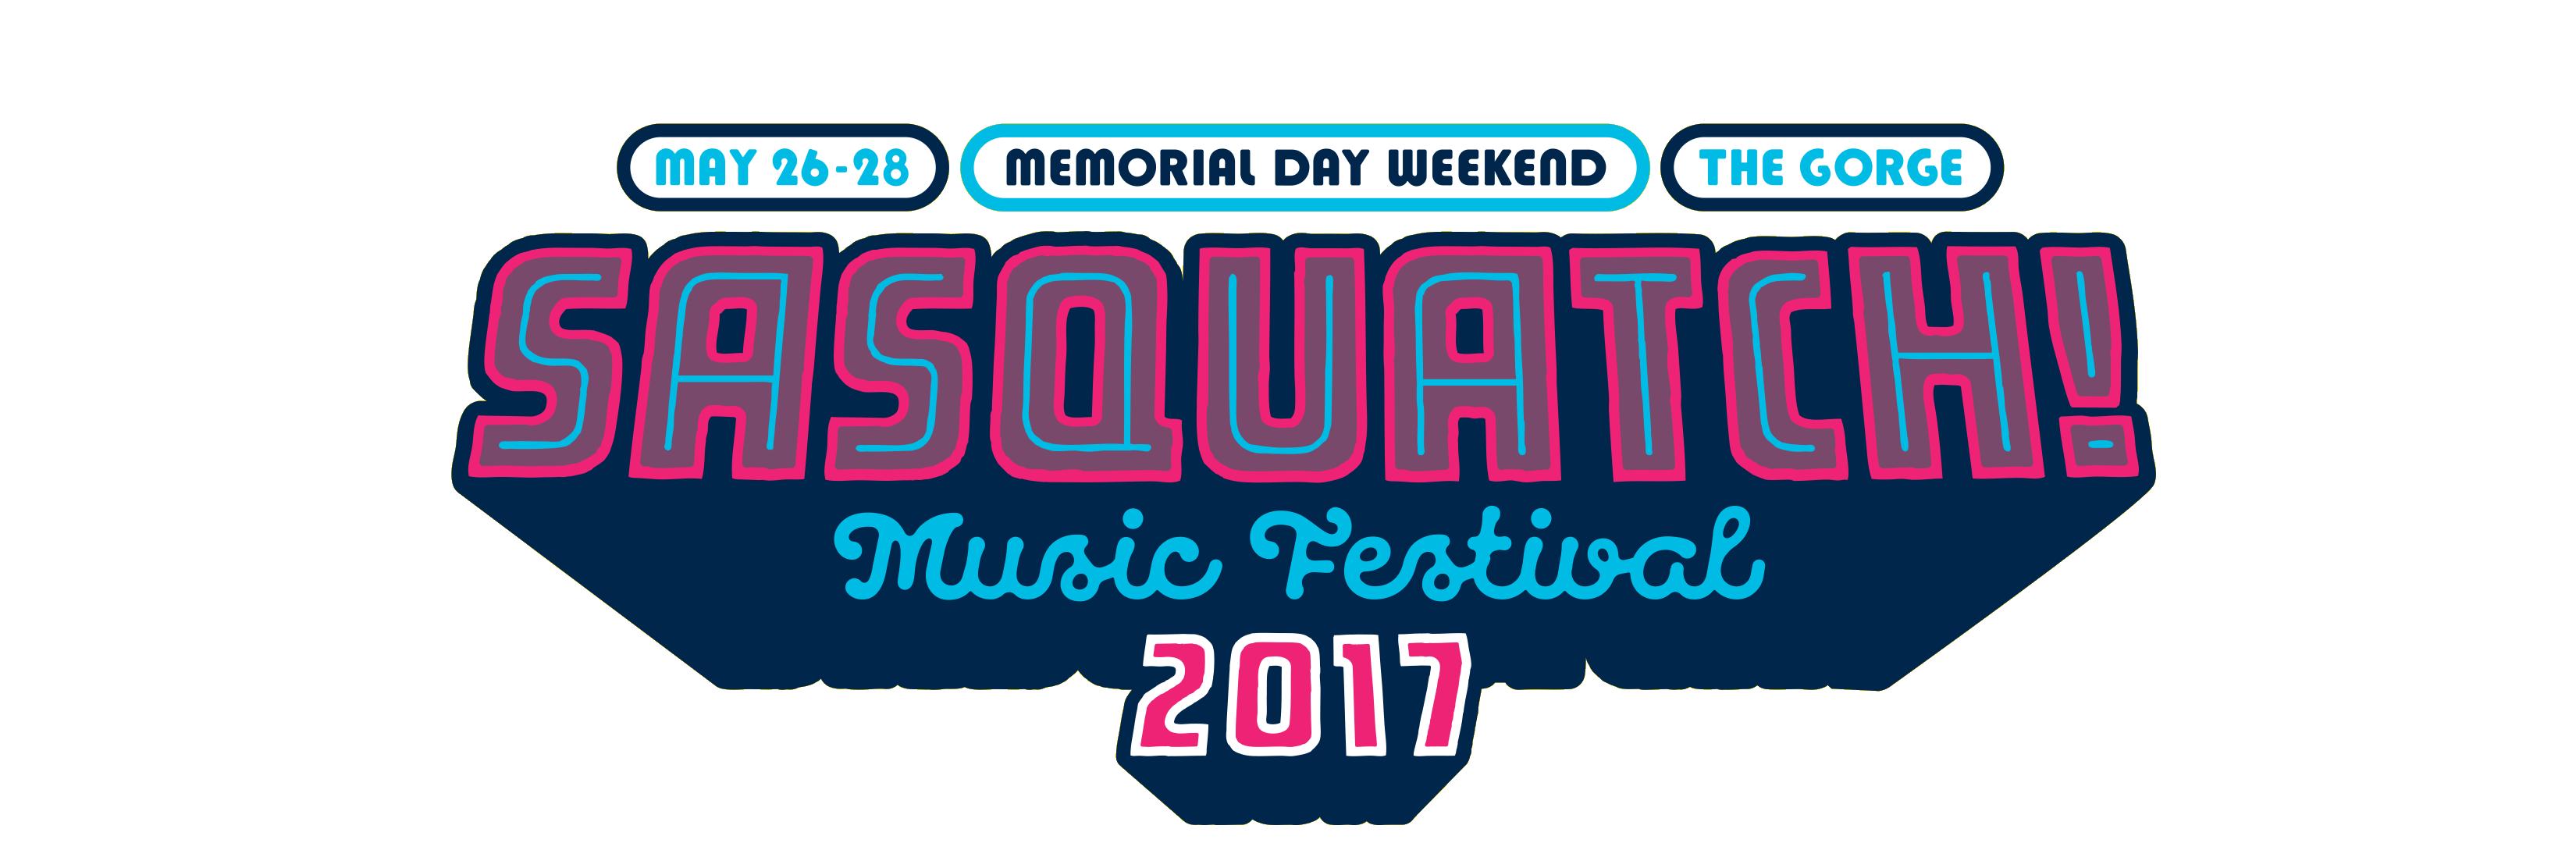 Sasquatch 2017 logo